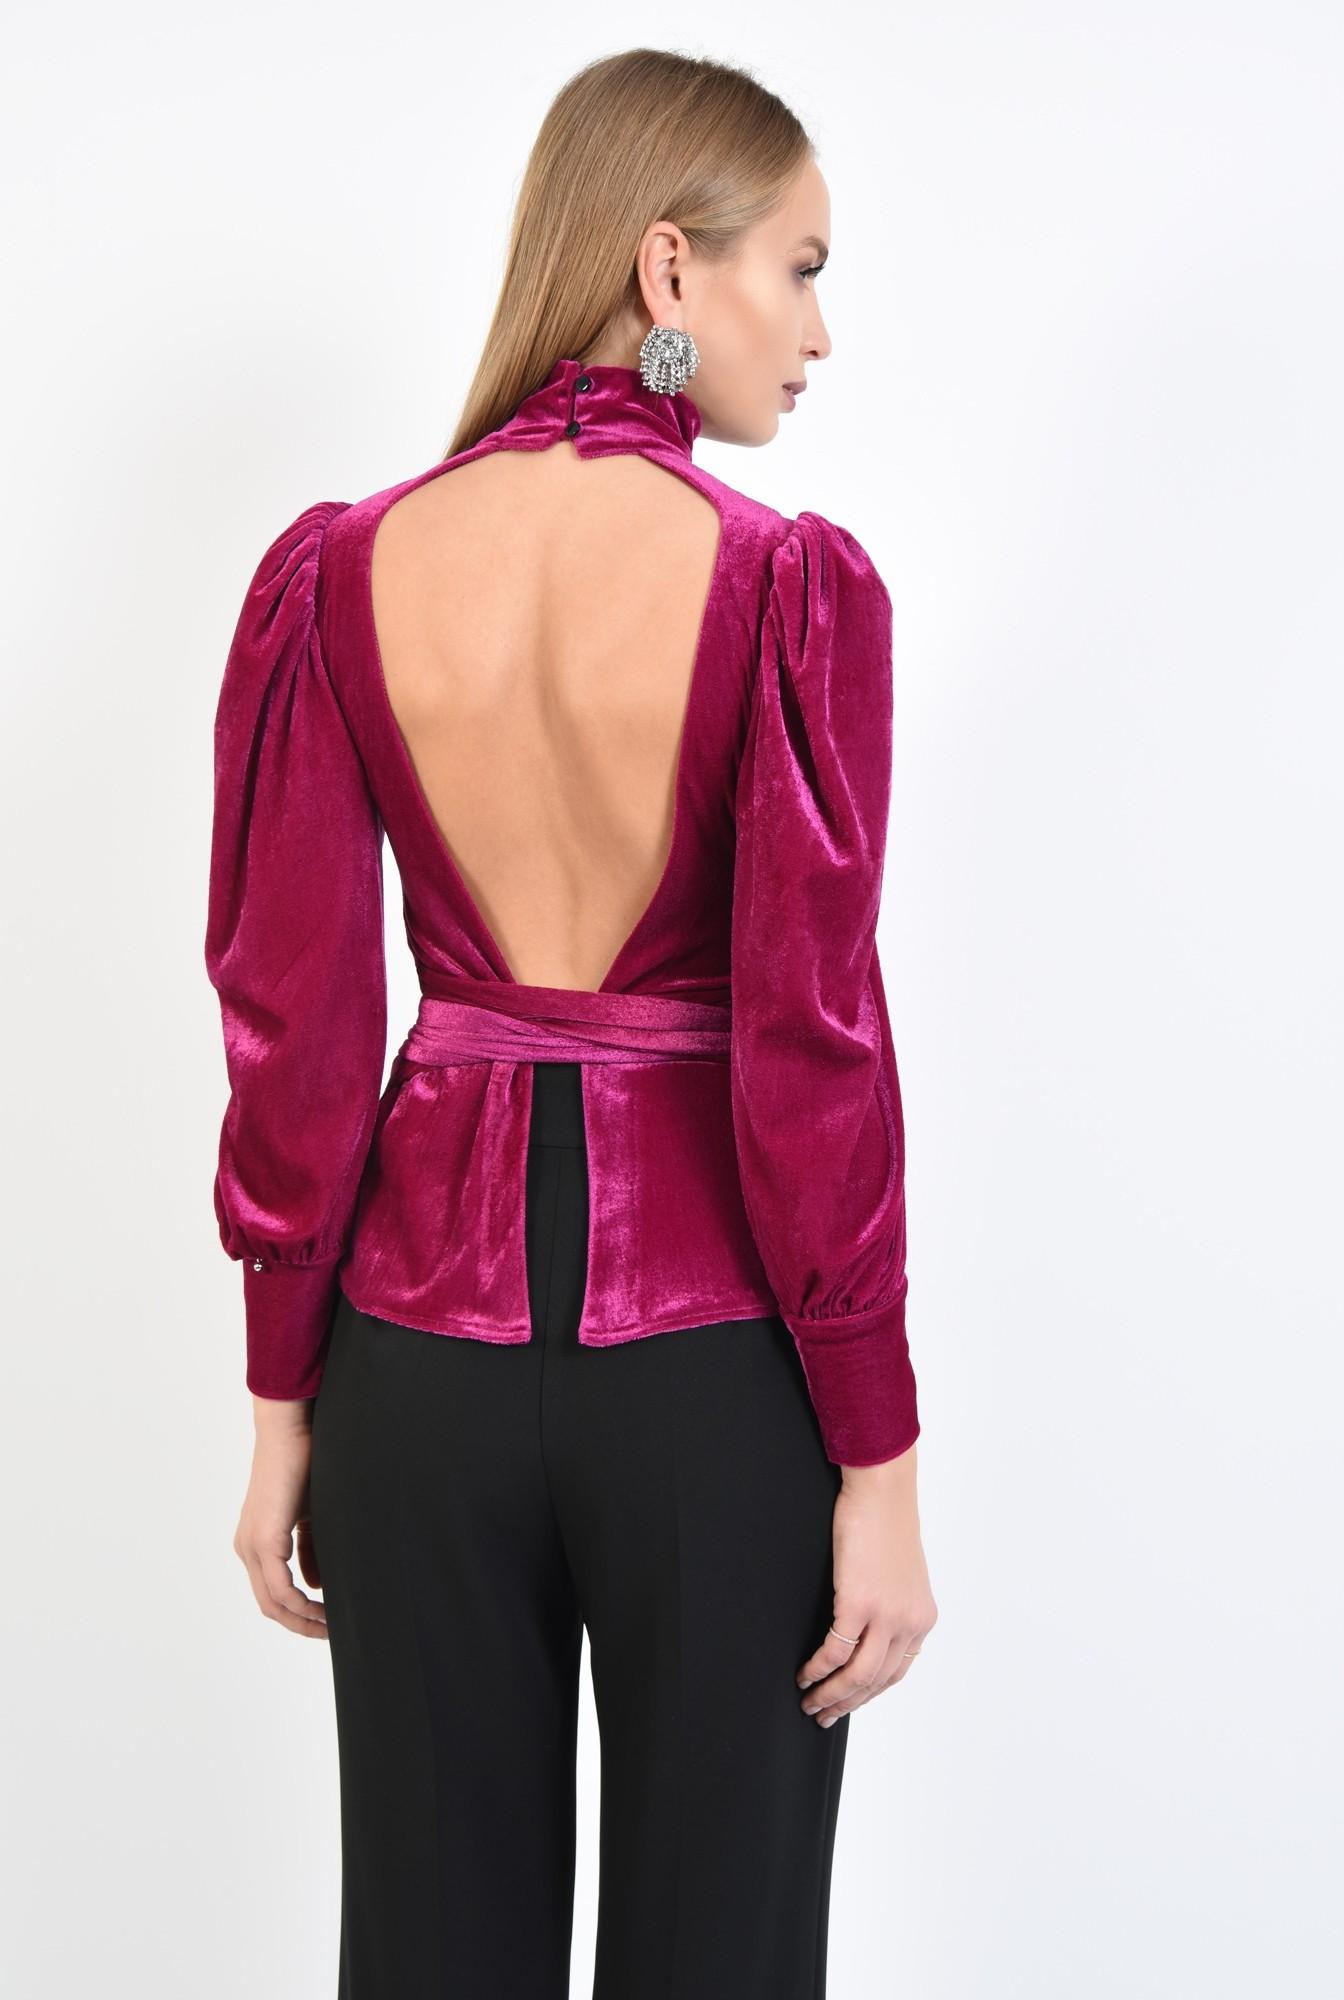 2 - 360 - bluza eleganta, roz ciclam, maneci bufante, funda la talie